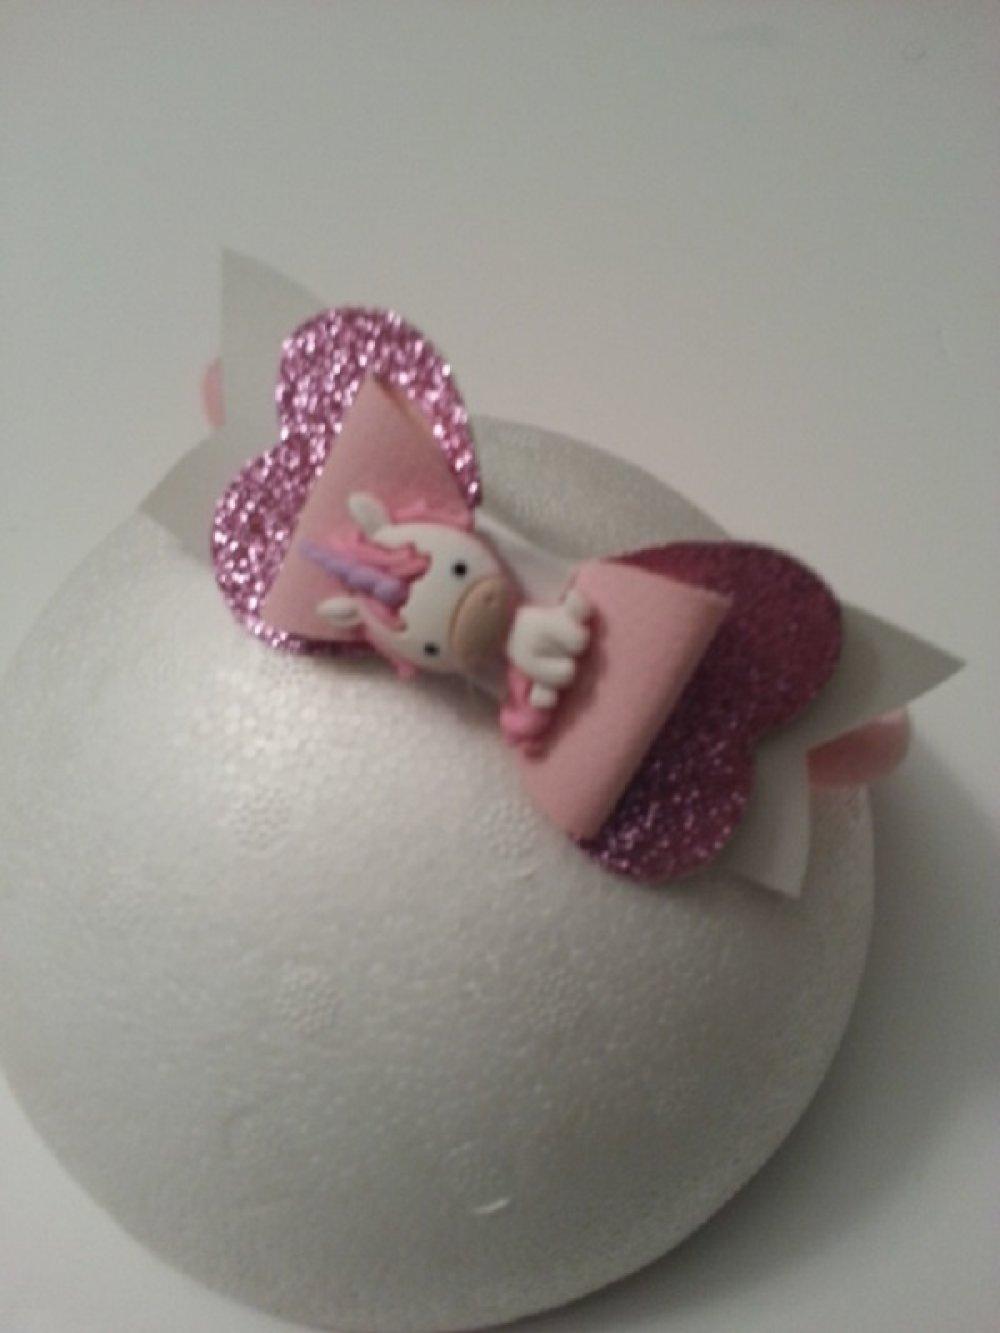 serre tête avec noeud simili cuir rose et blanc cabochon licorne rose